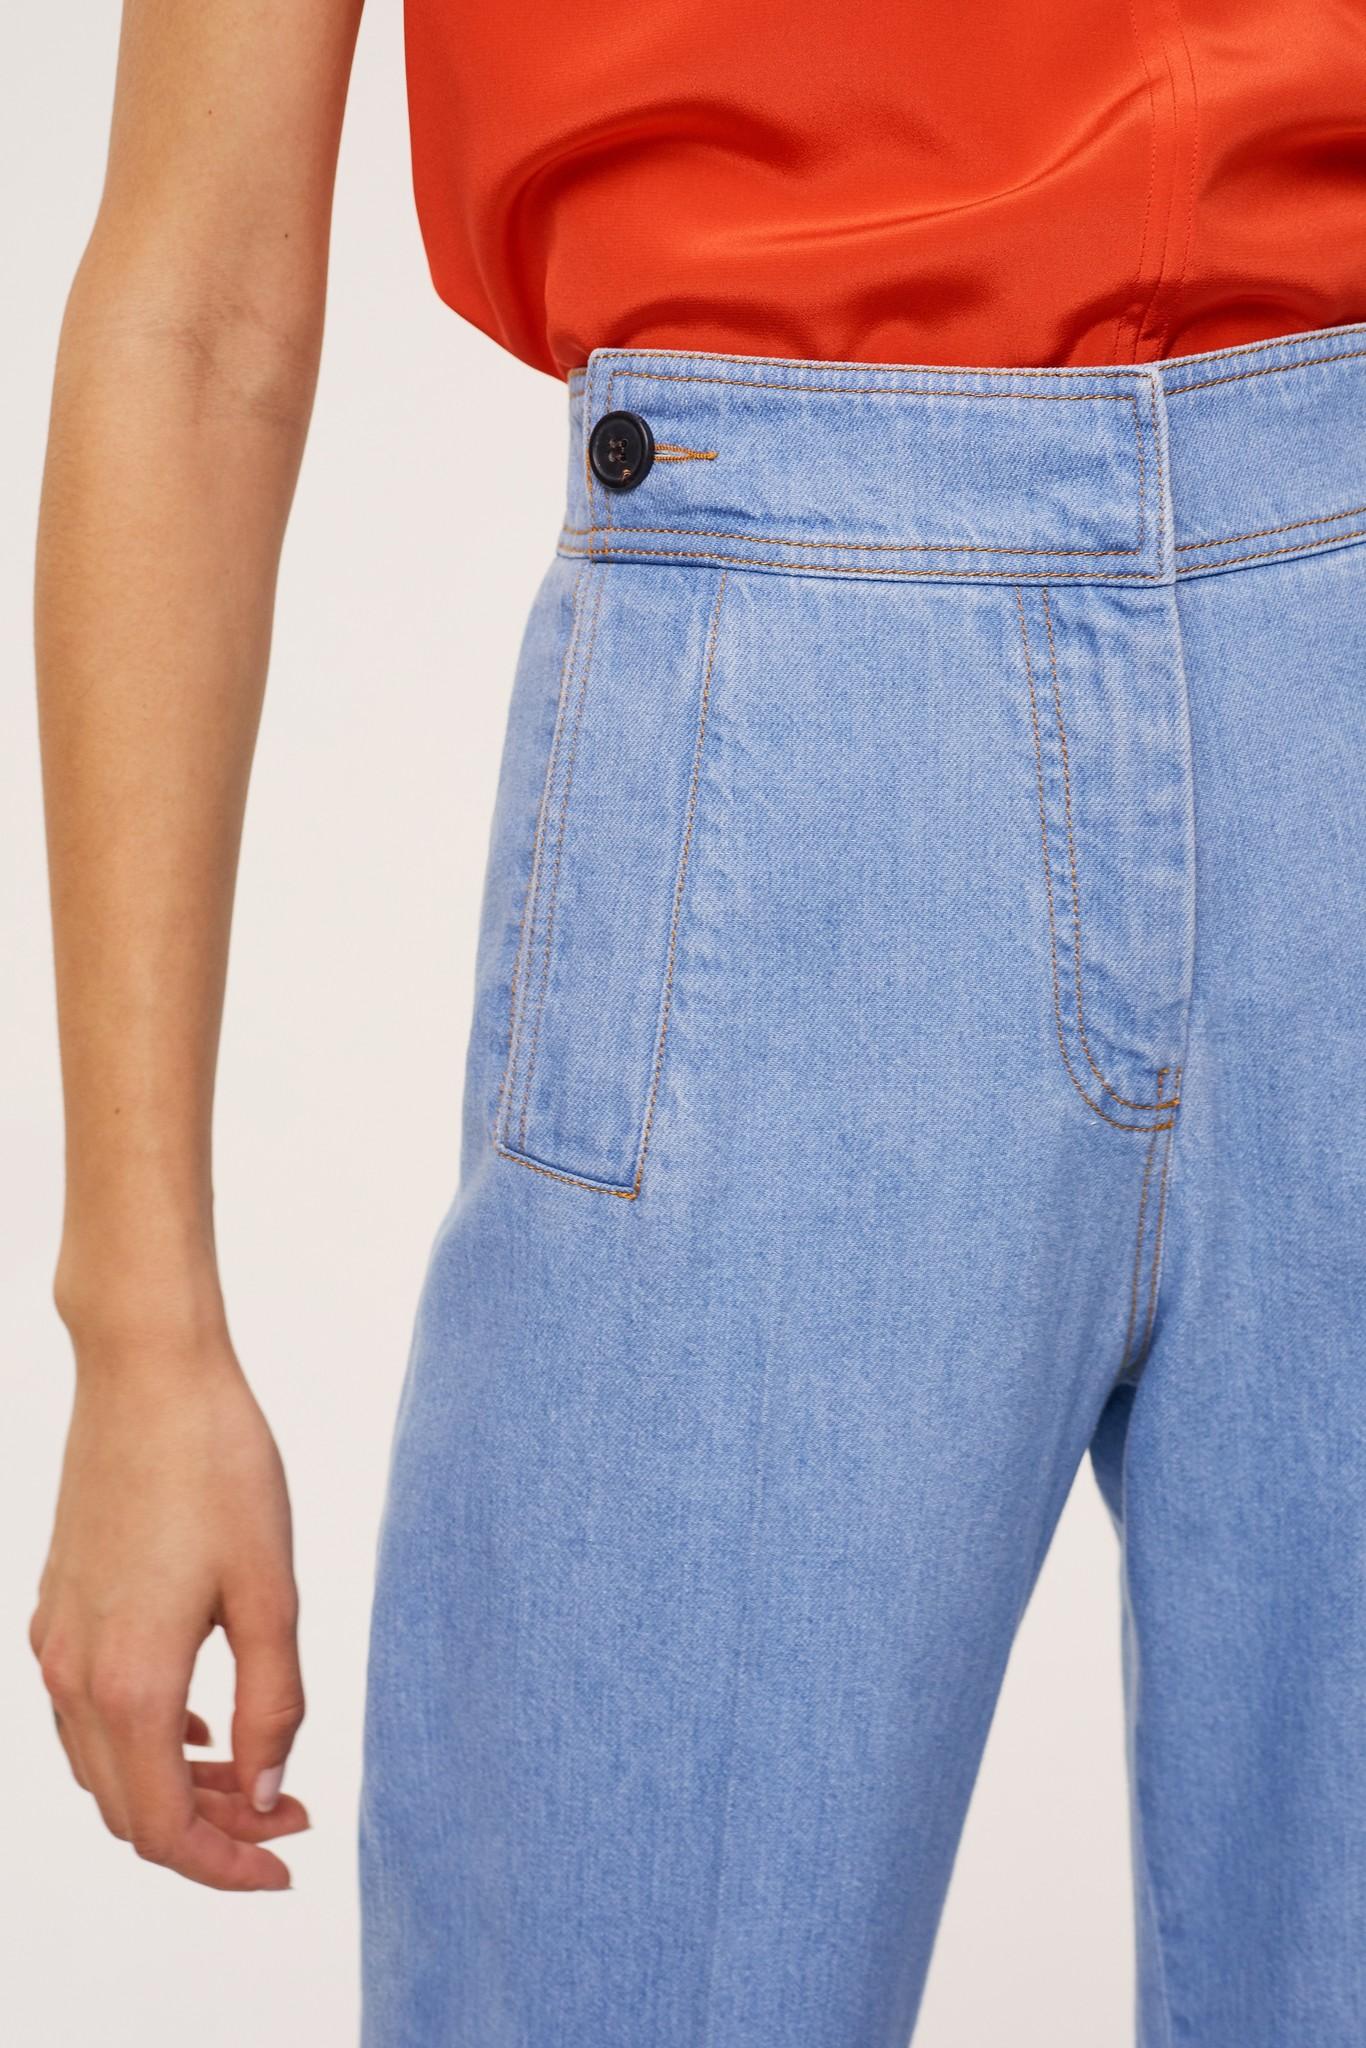 JASON - Легкие джинсы-морячка